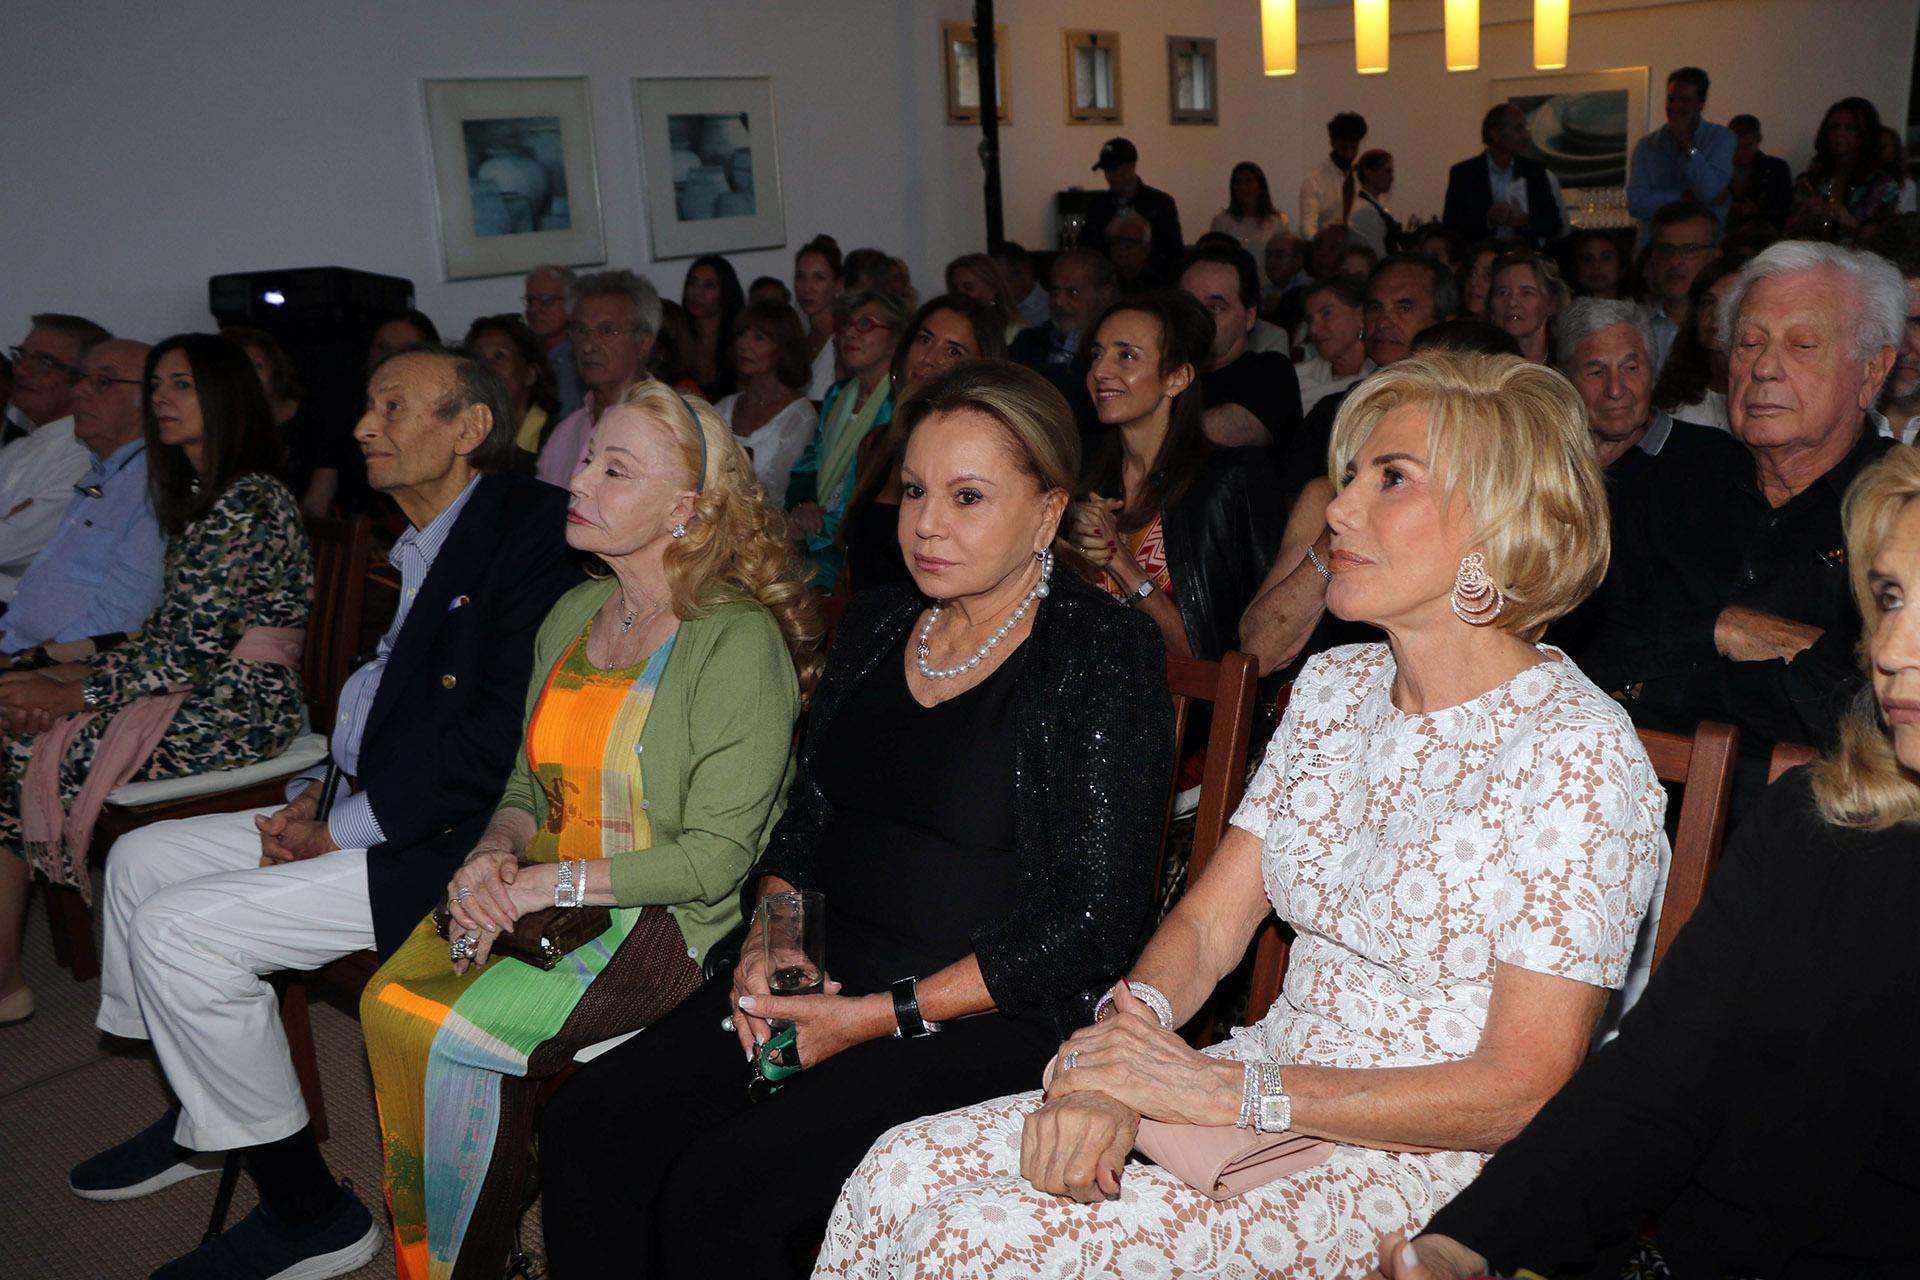 Laetitia D'Arenberg, Jacqueline Vik y Ada de Maurier en primera fila